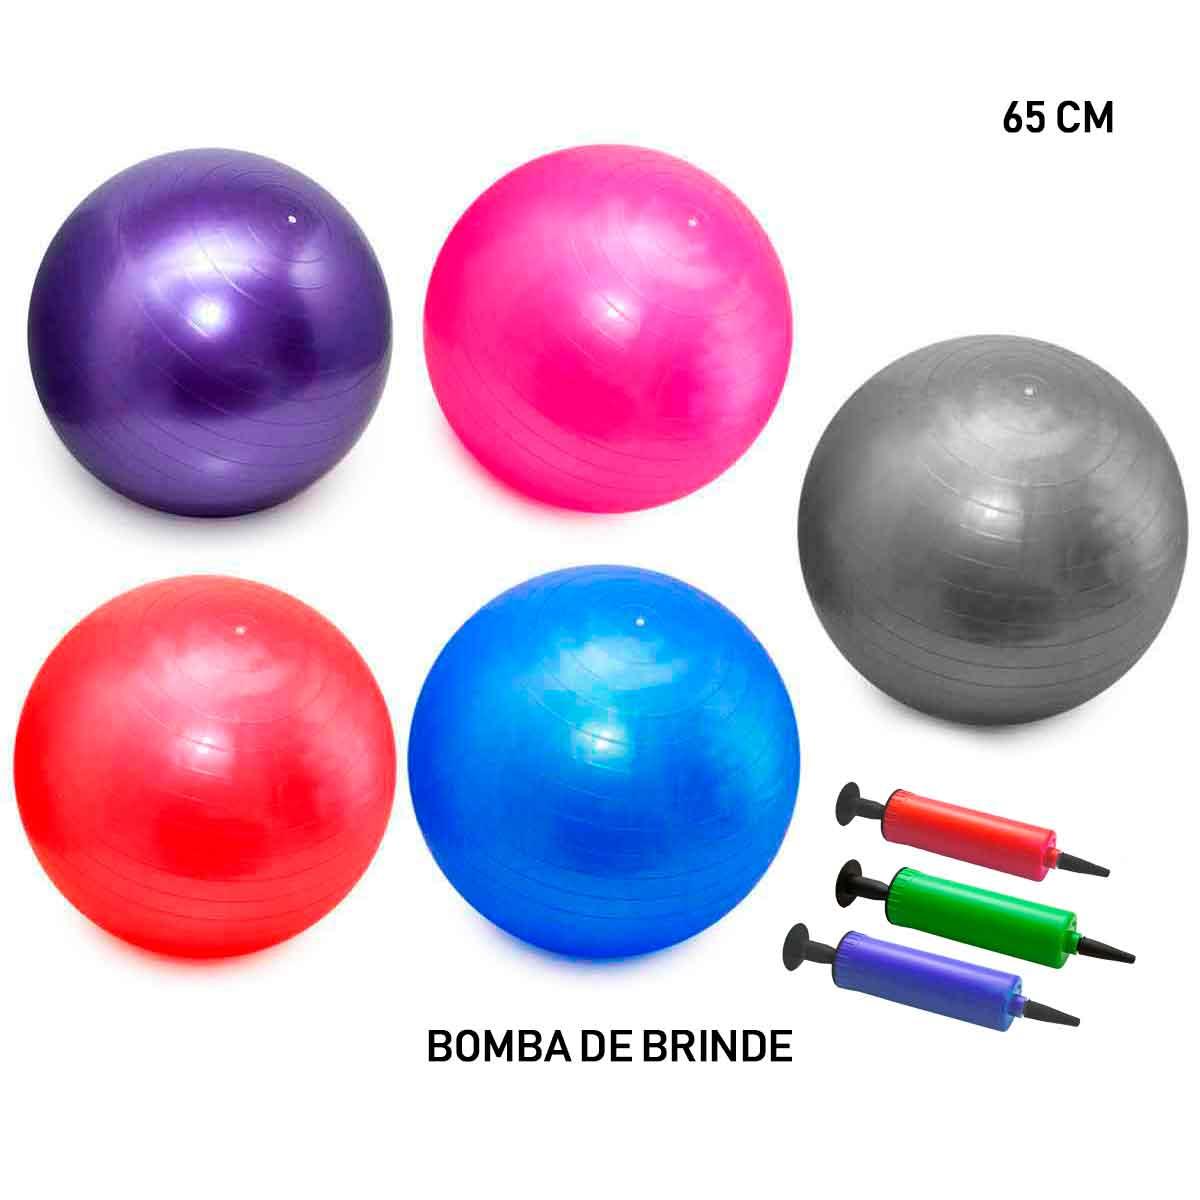 Bola Pilates Yoga Abdominal Ginastica Fitness 55cm C/ Bomba